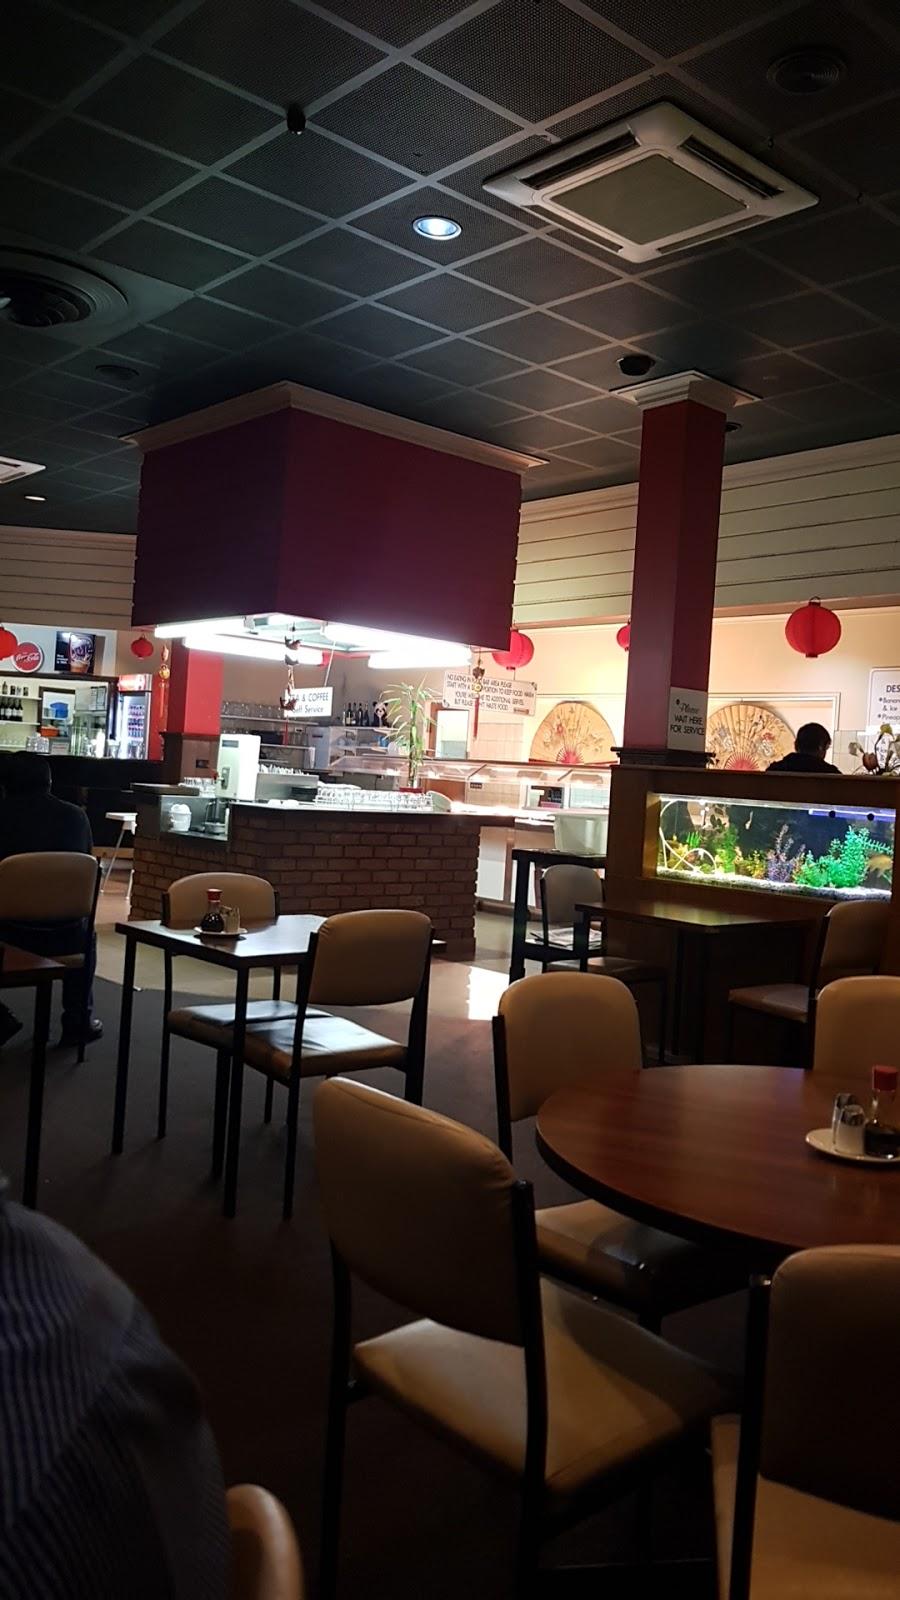 Shepparton Family Restaurant | restaurant | 302/308 Wyndham St, Shepparton VIC 3630, Australia | 0358213737 OR +61 3 5821 3737